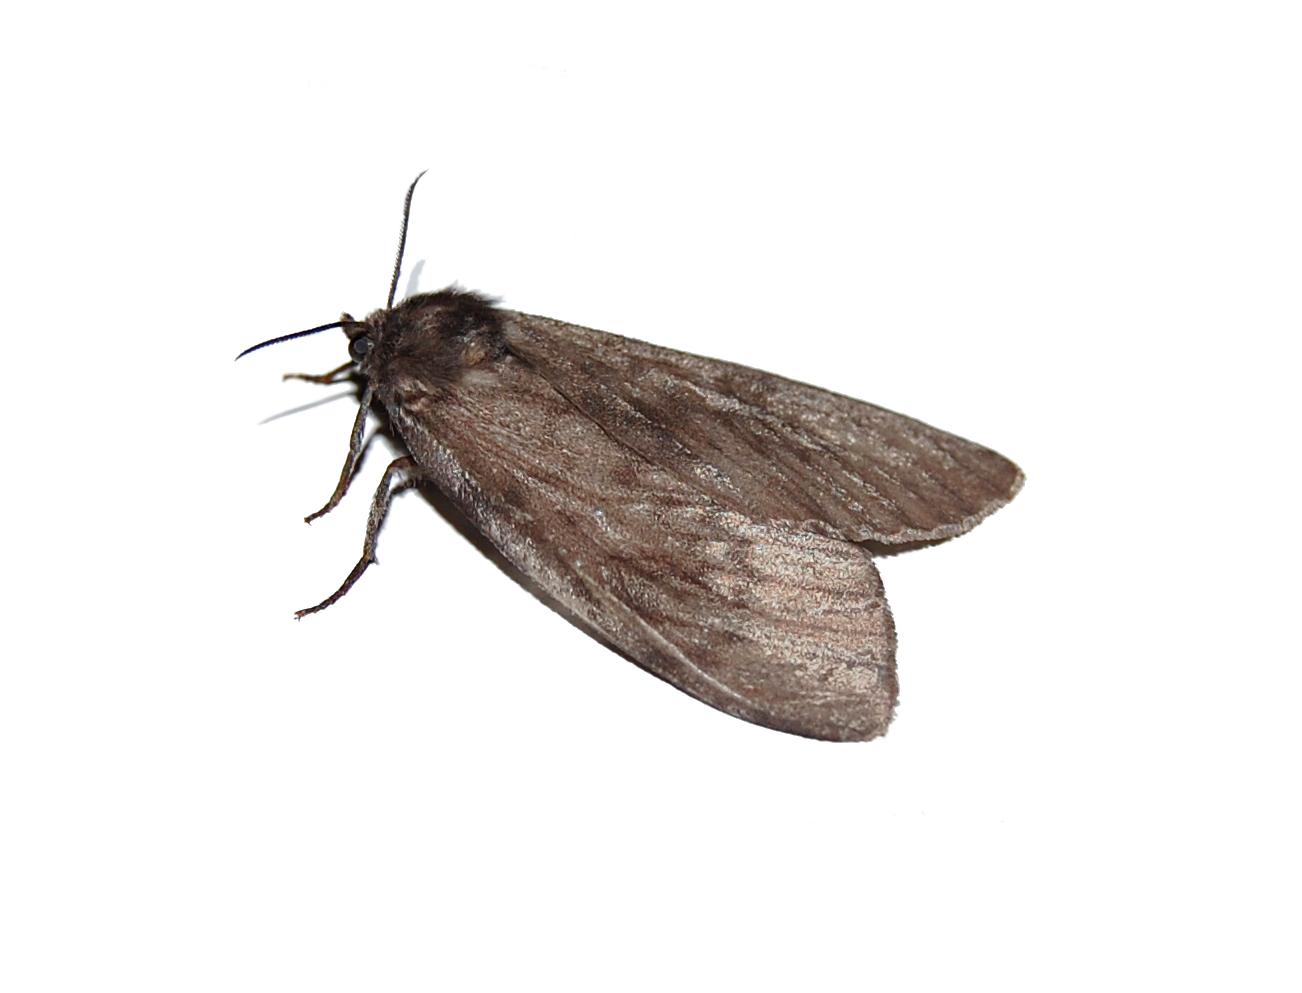 night-moth-1352686.jpg